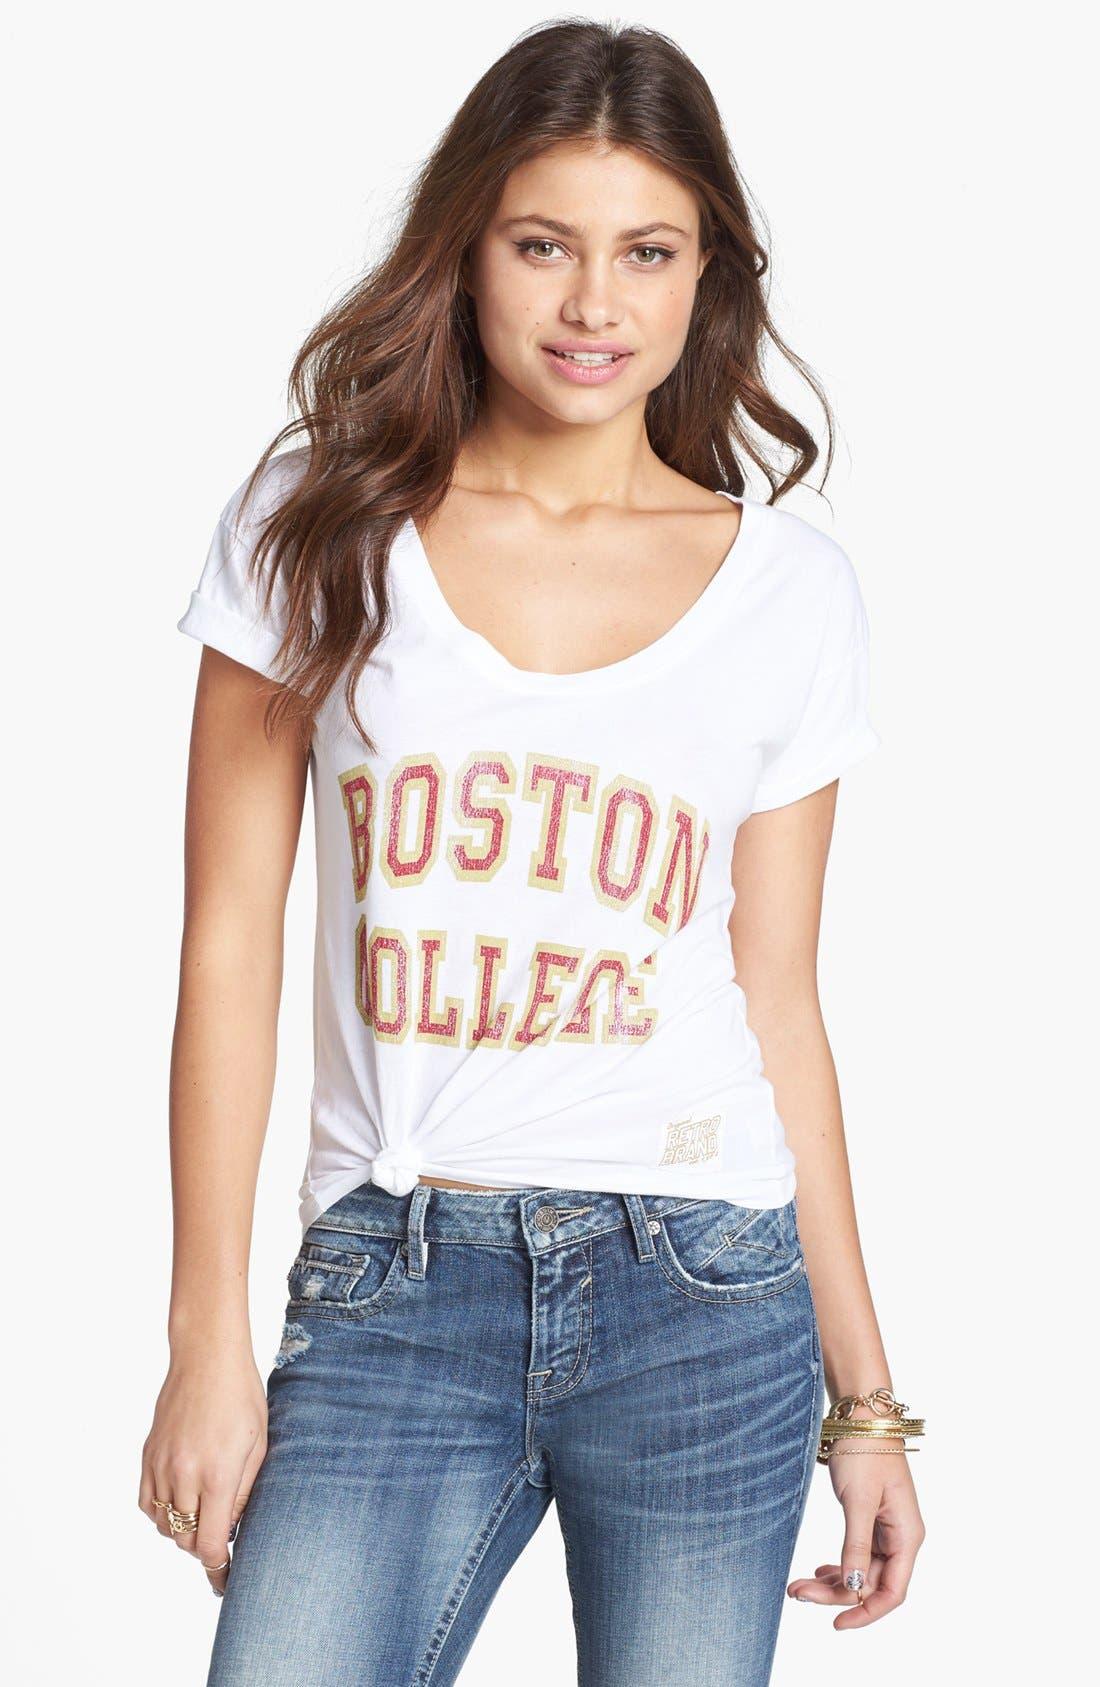 Alternate Image 1 Selected - Retro Brand 'Boston College' Graphic Tee (Juniors)